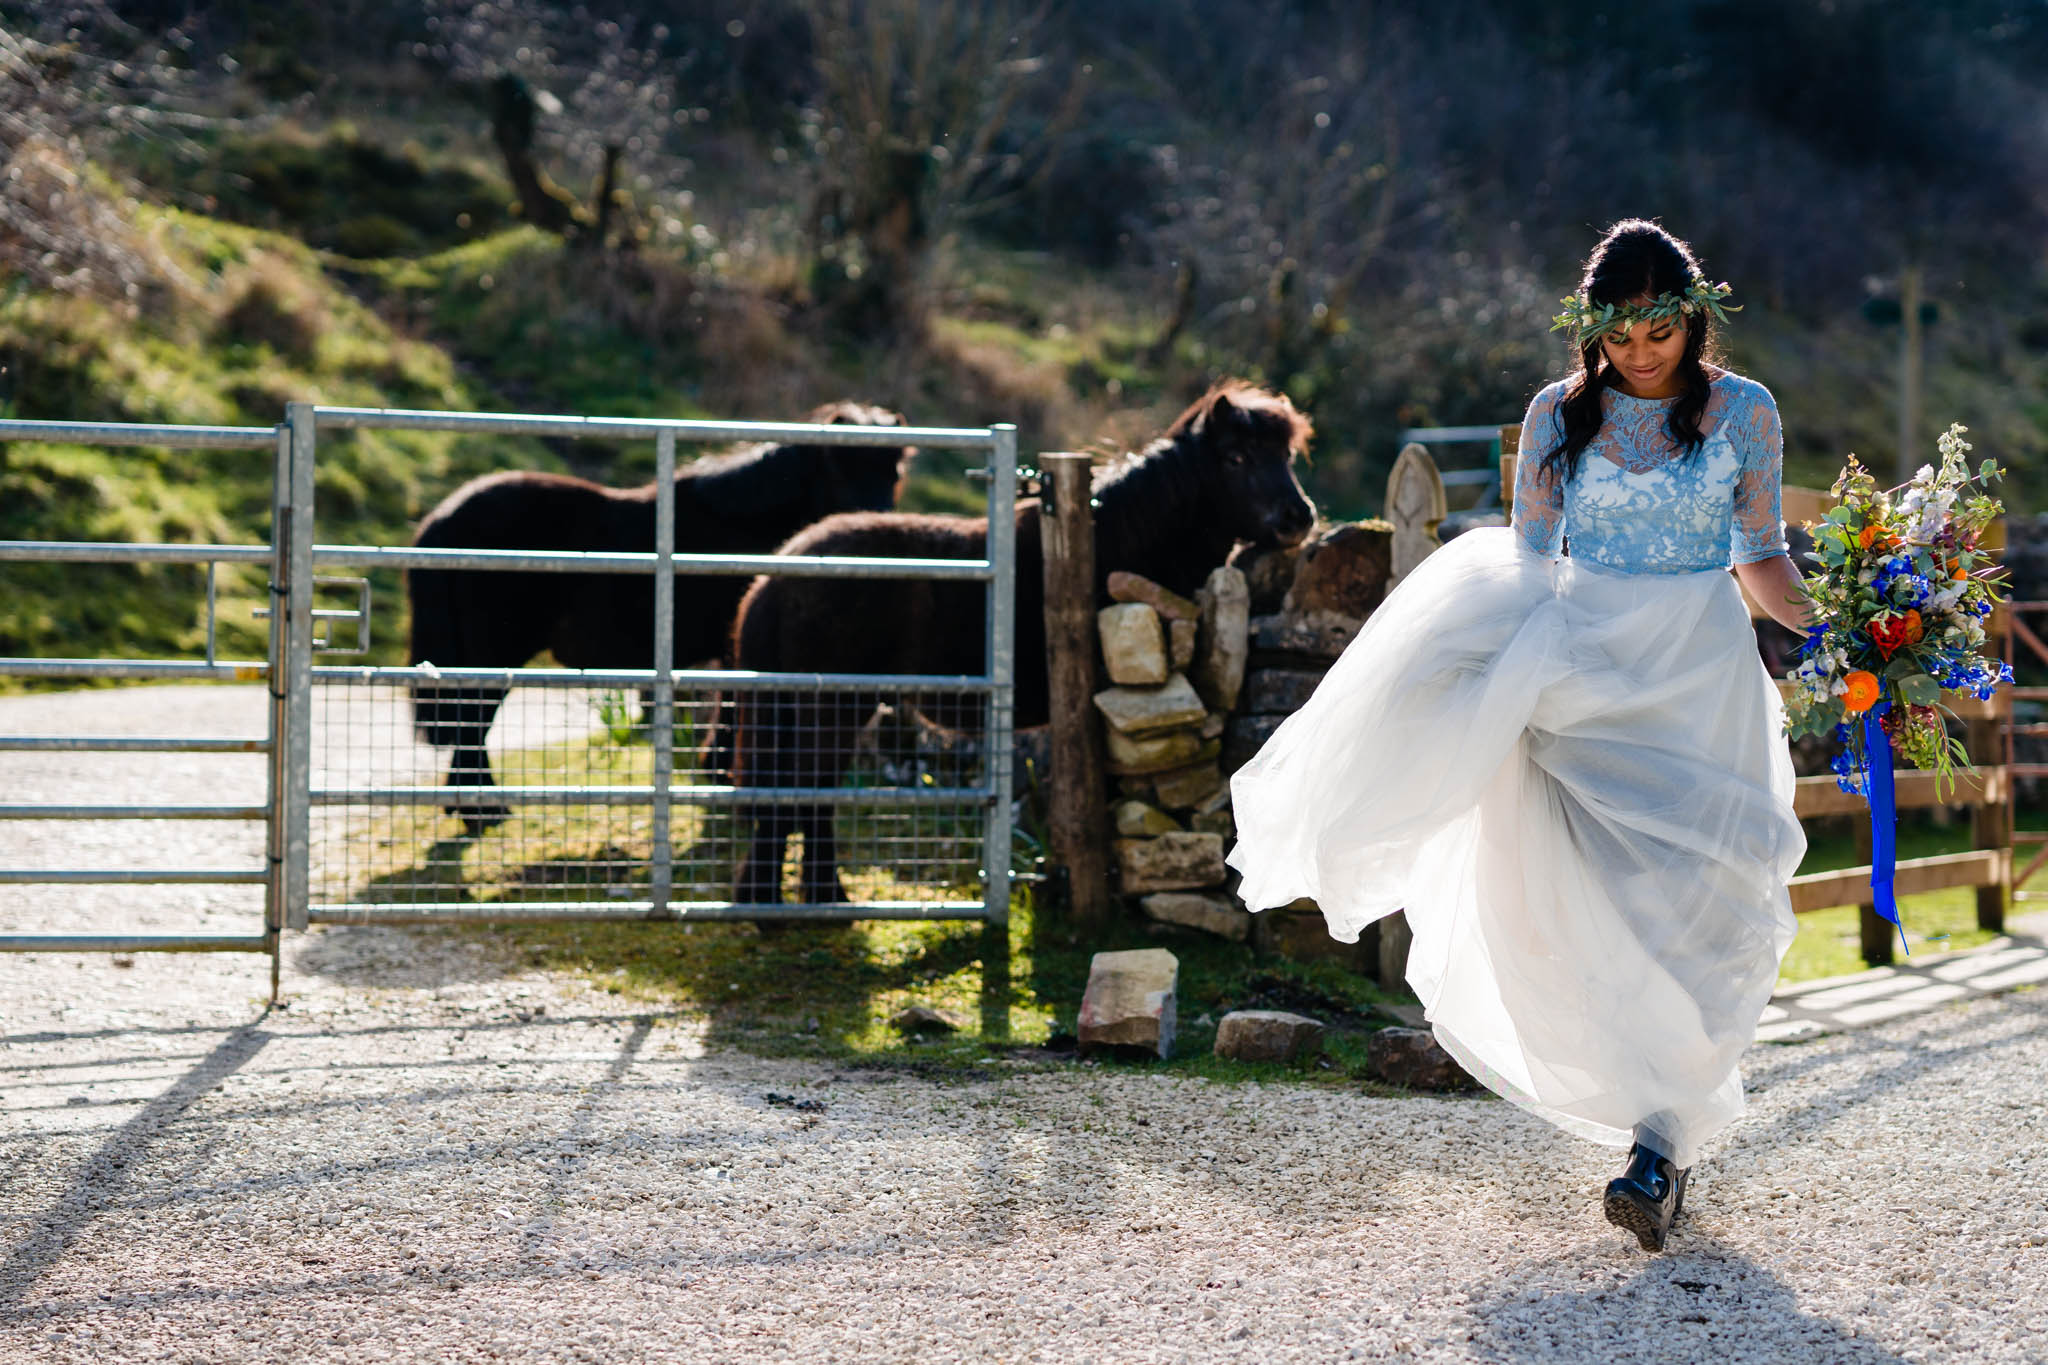 Vicki Clayson Photography - Alternative wedding photography - leicester wedding photographer 4